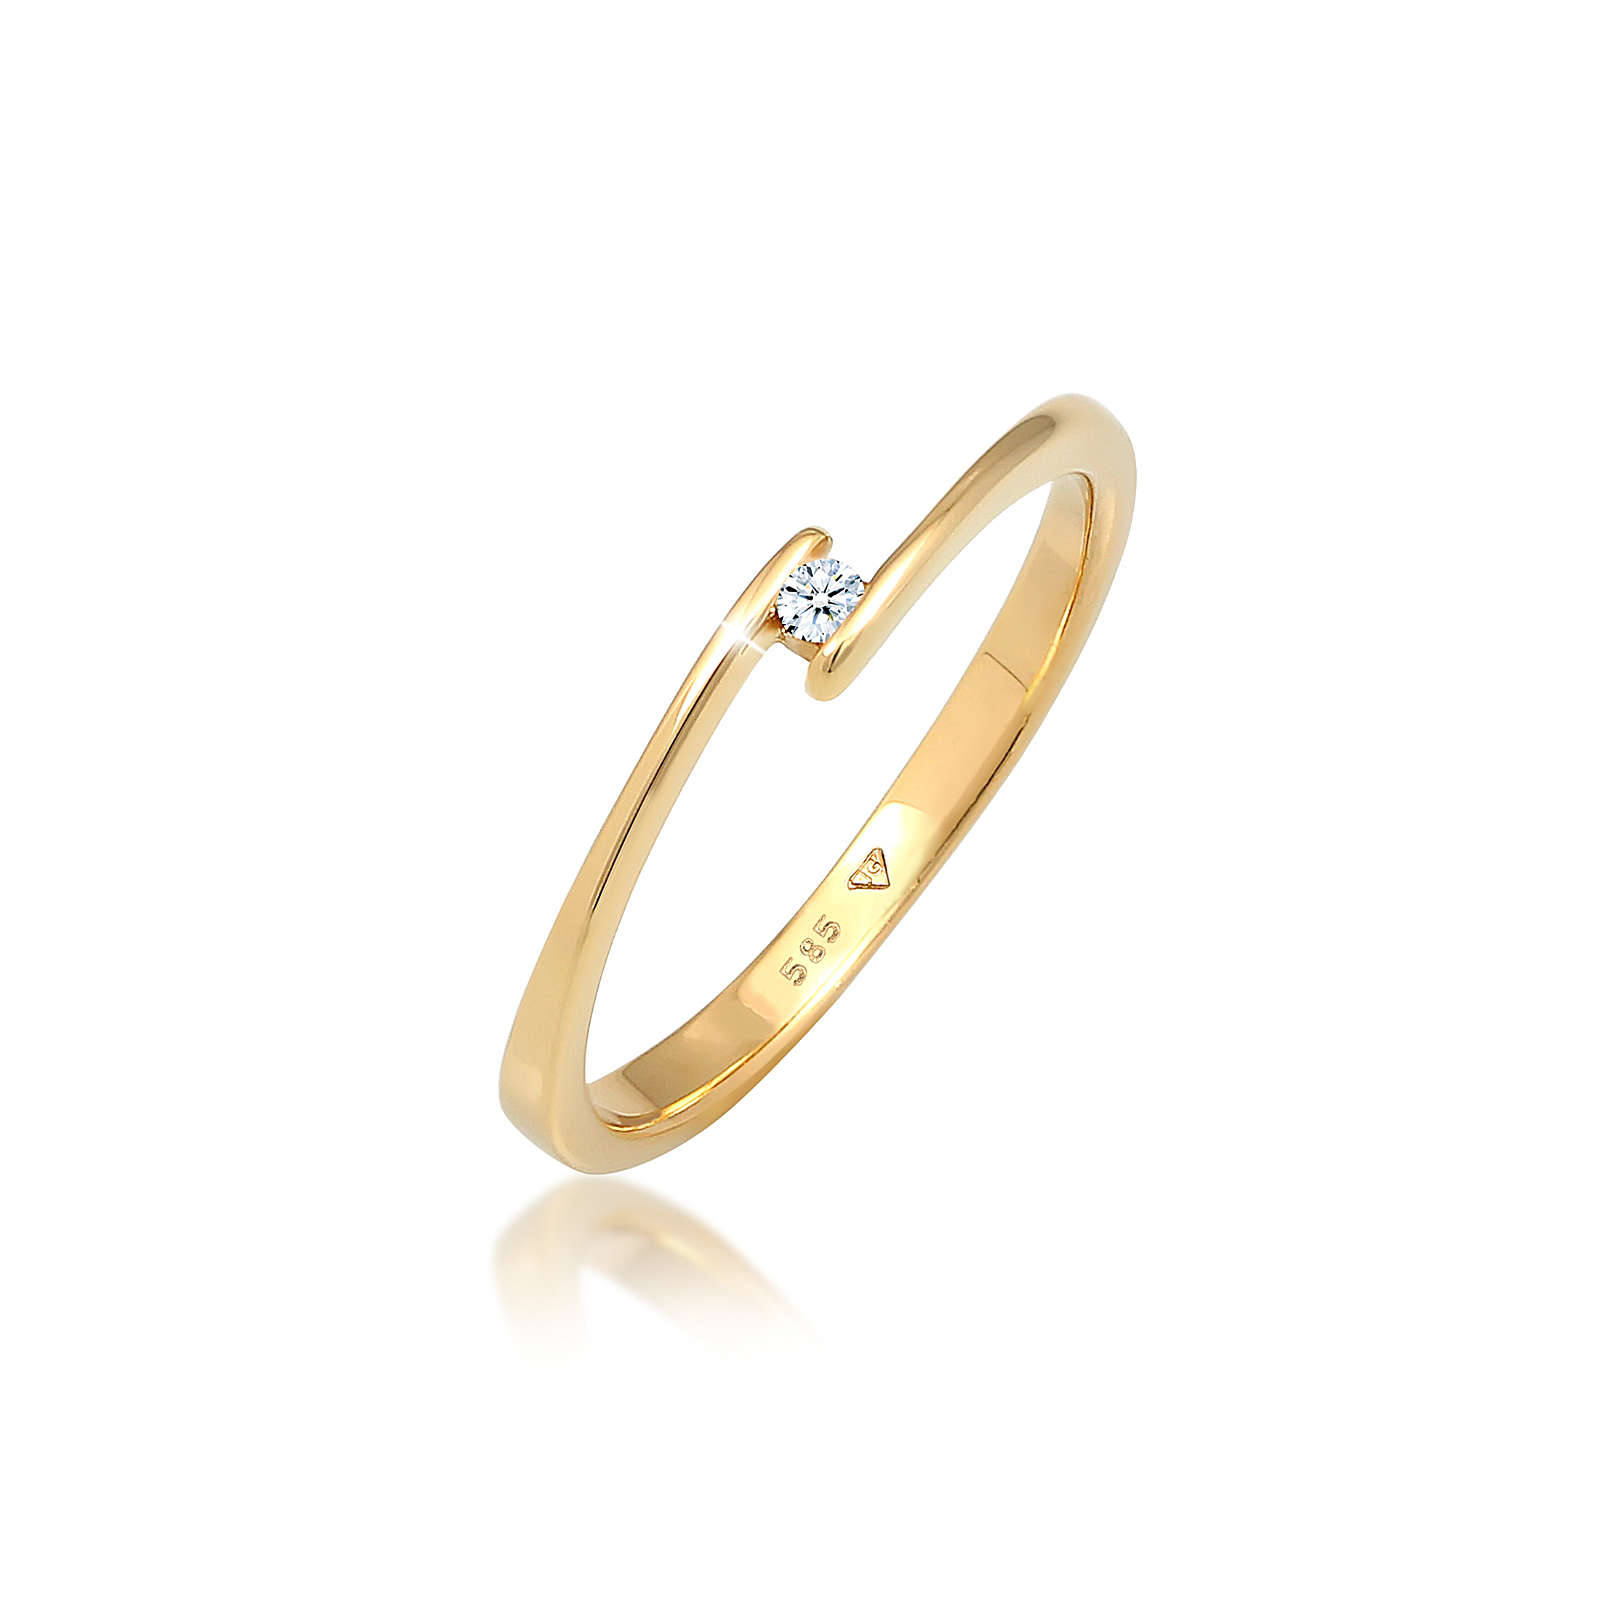 Diamore Ring Solitär Verlobungsring Diamant 0.03 ct. 585 Gold Ringe gold Damen Gr. 54